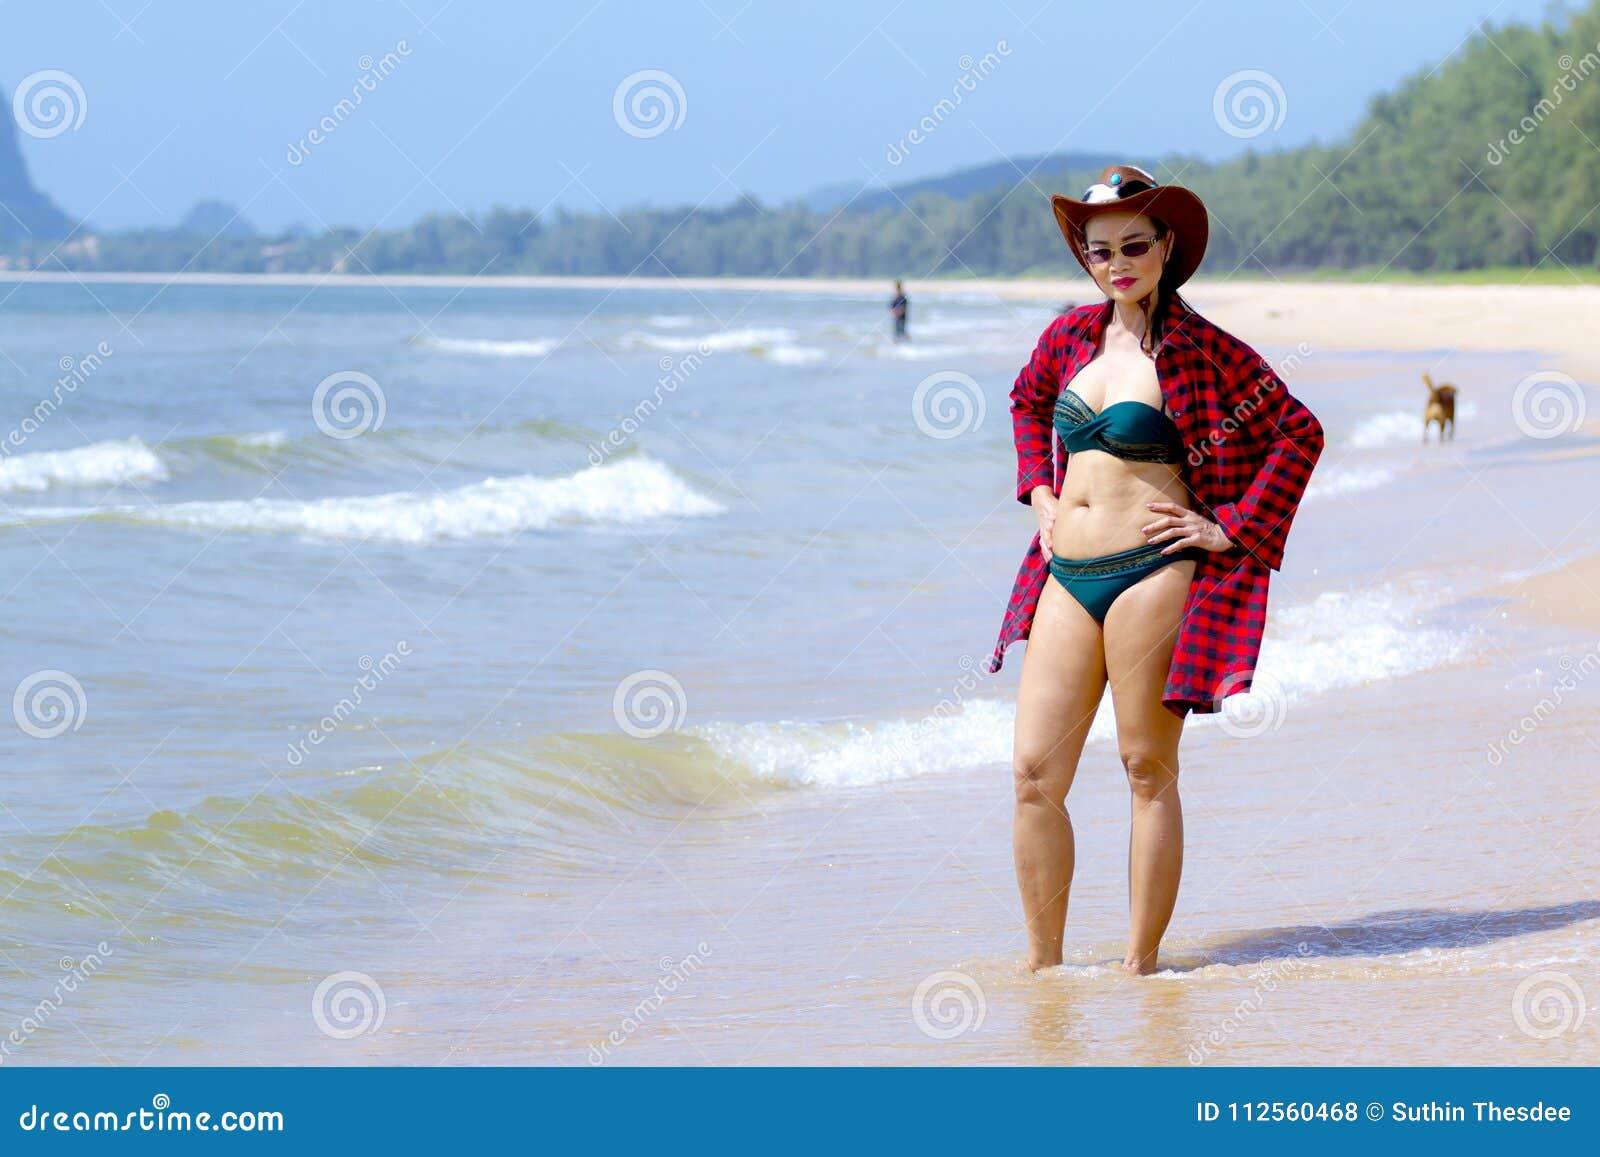 1acc01b0441 Woman shape and bikini daylight on beach at Bang Beot beach, Chumphon  Province Thailand. More similar stock images